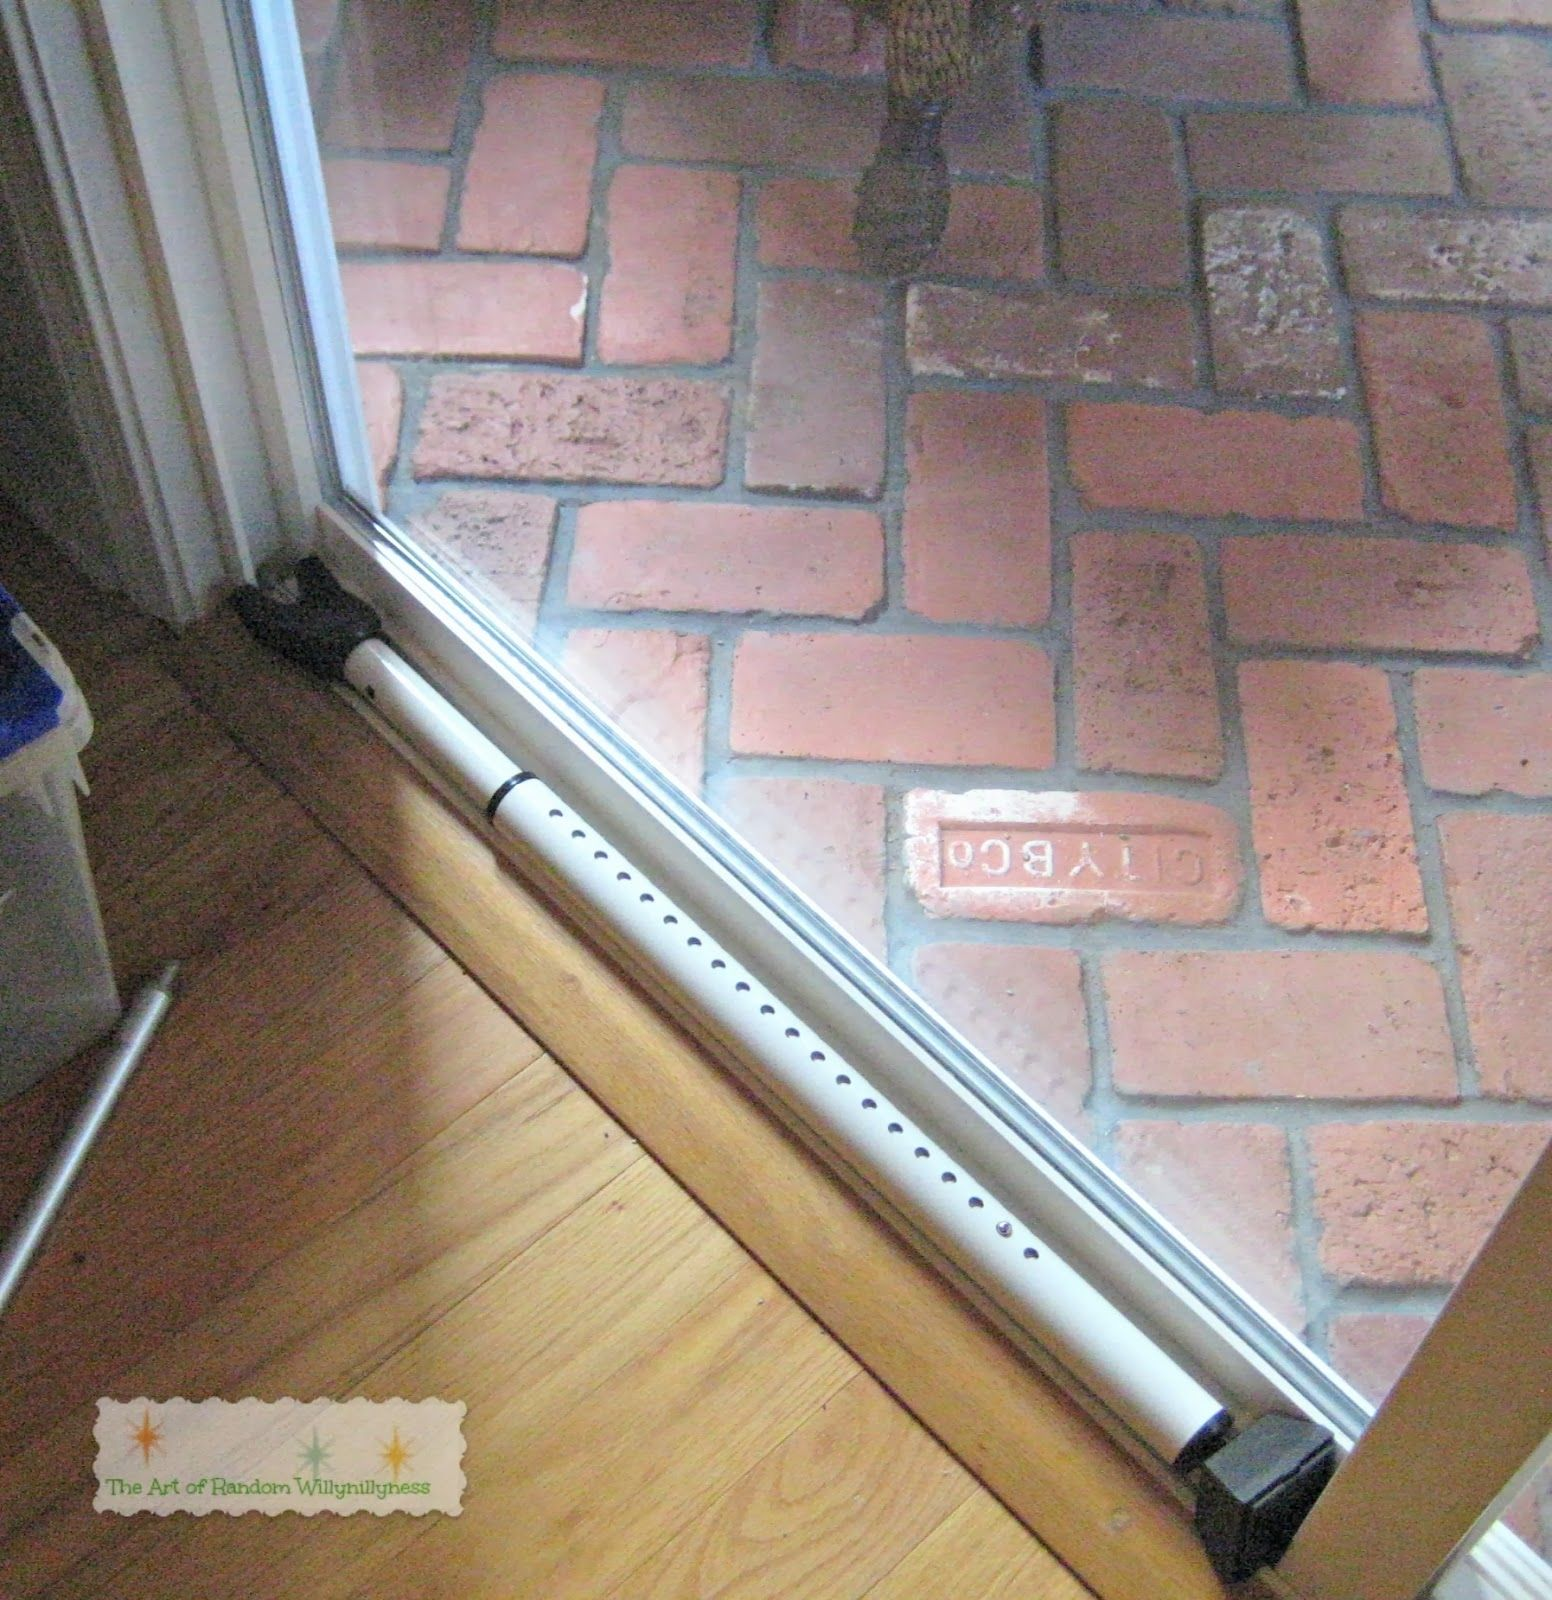 Security Bar Lock For Sliding Glass Doors Design Patio Door Locks Sliding Glass Doors Patio Door Lock Security